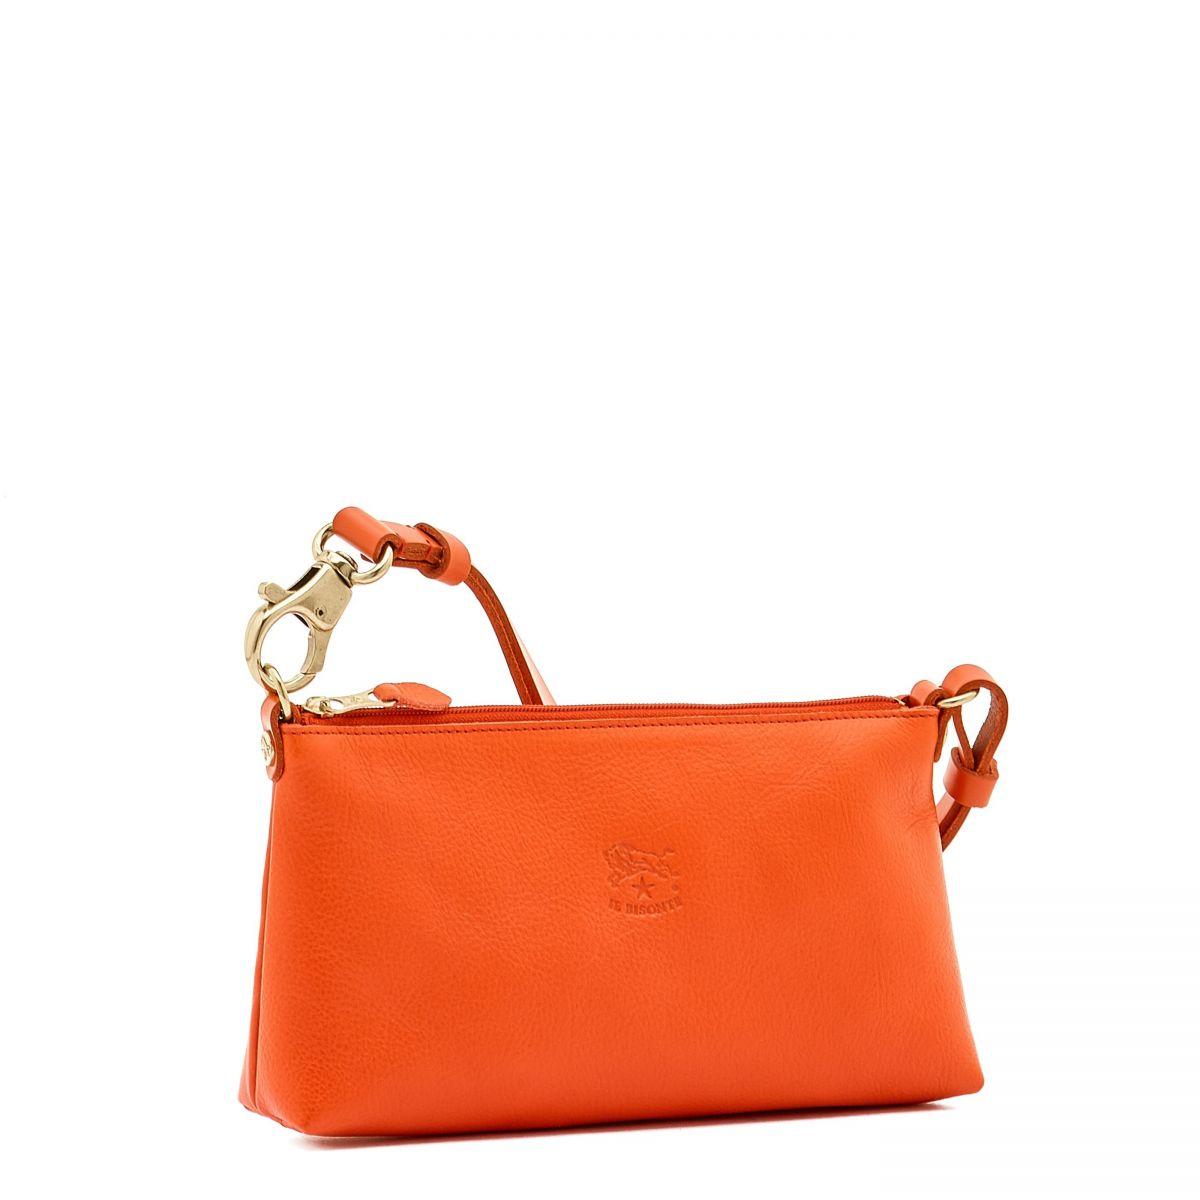 Women's Shoulder Bag in Cowhide Leather BSH012 color Gazpacho | Details